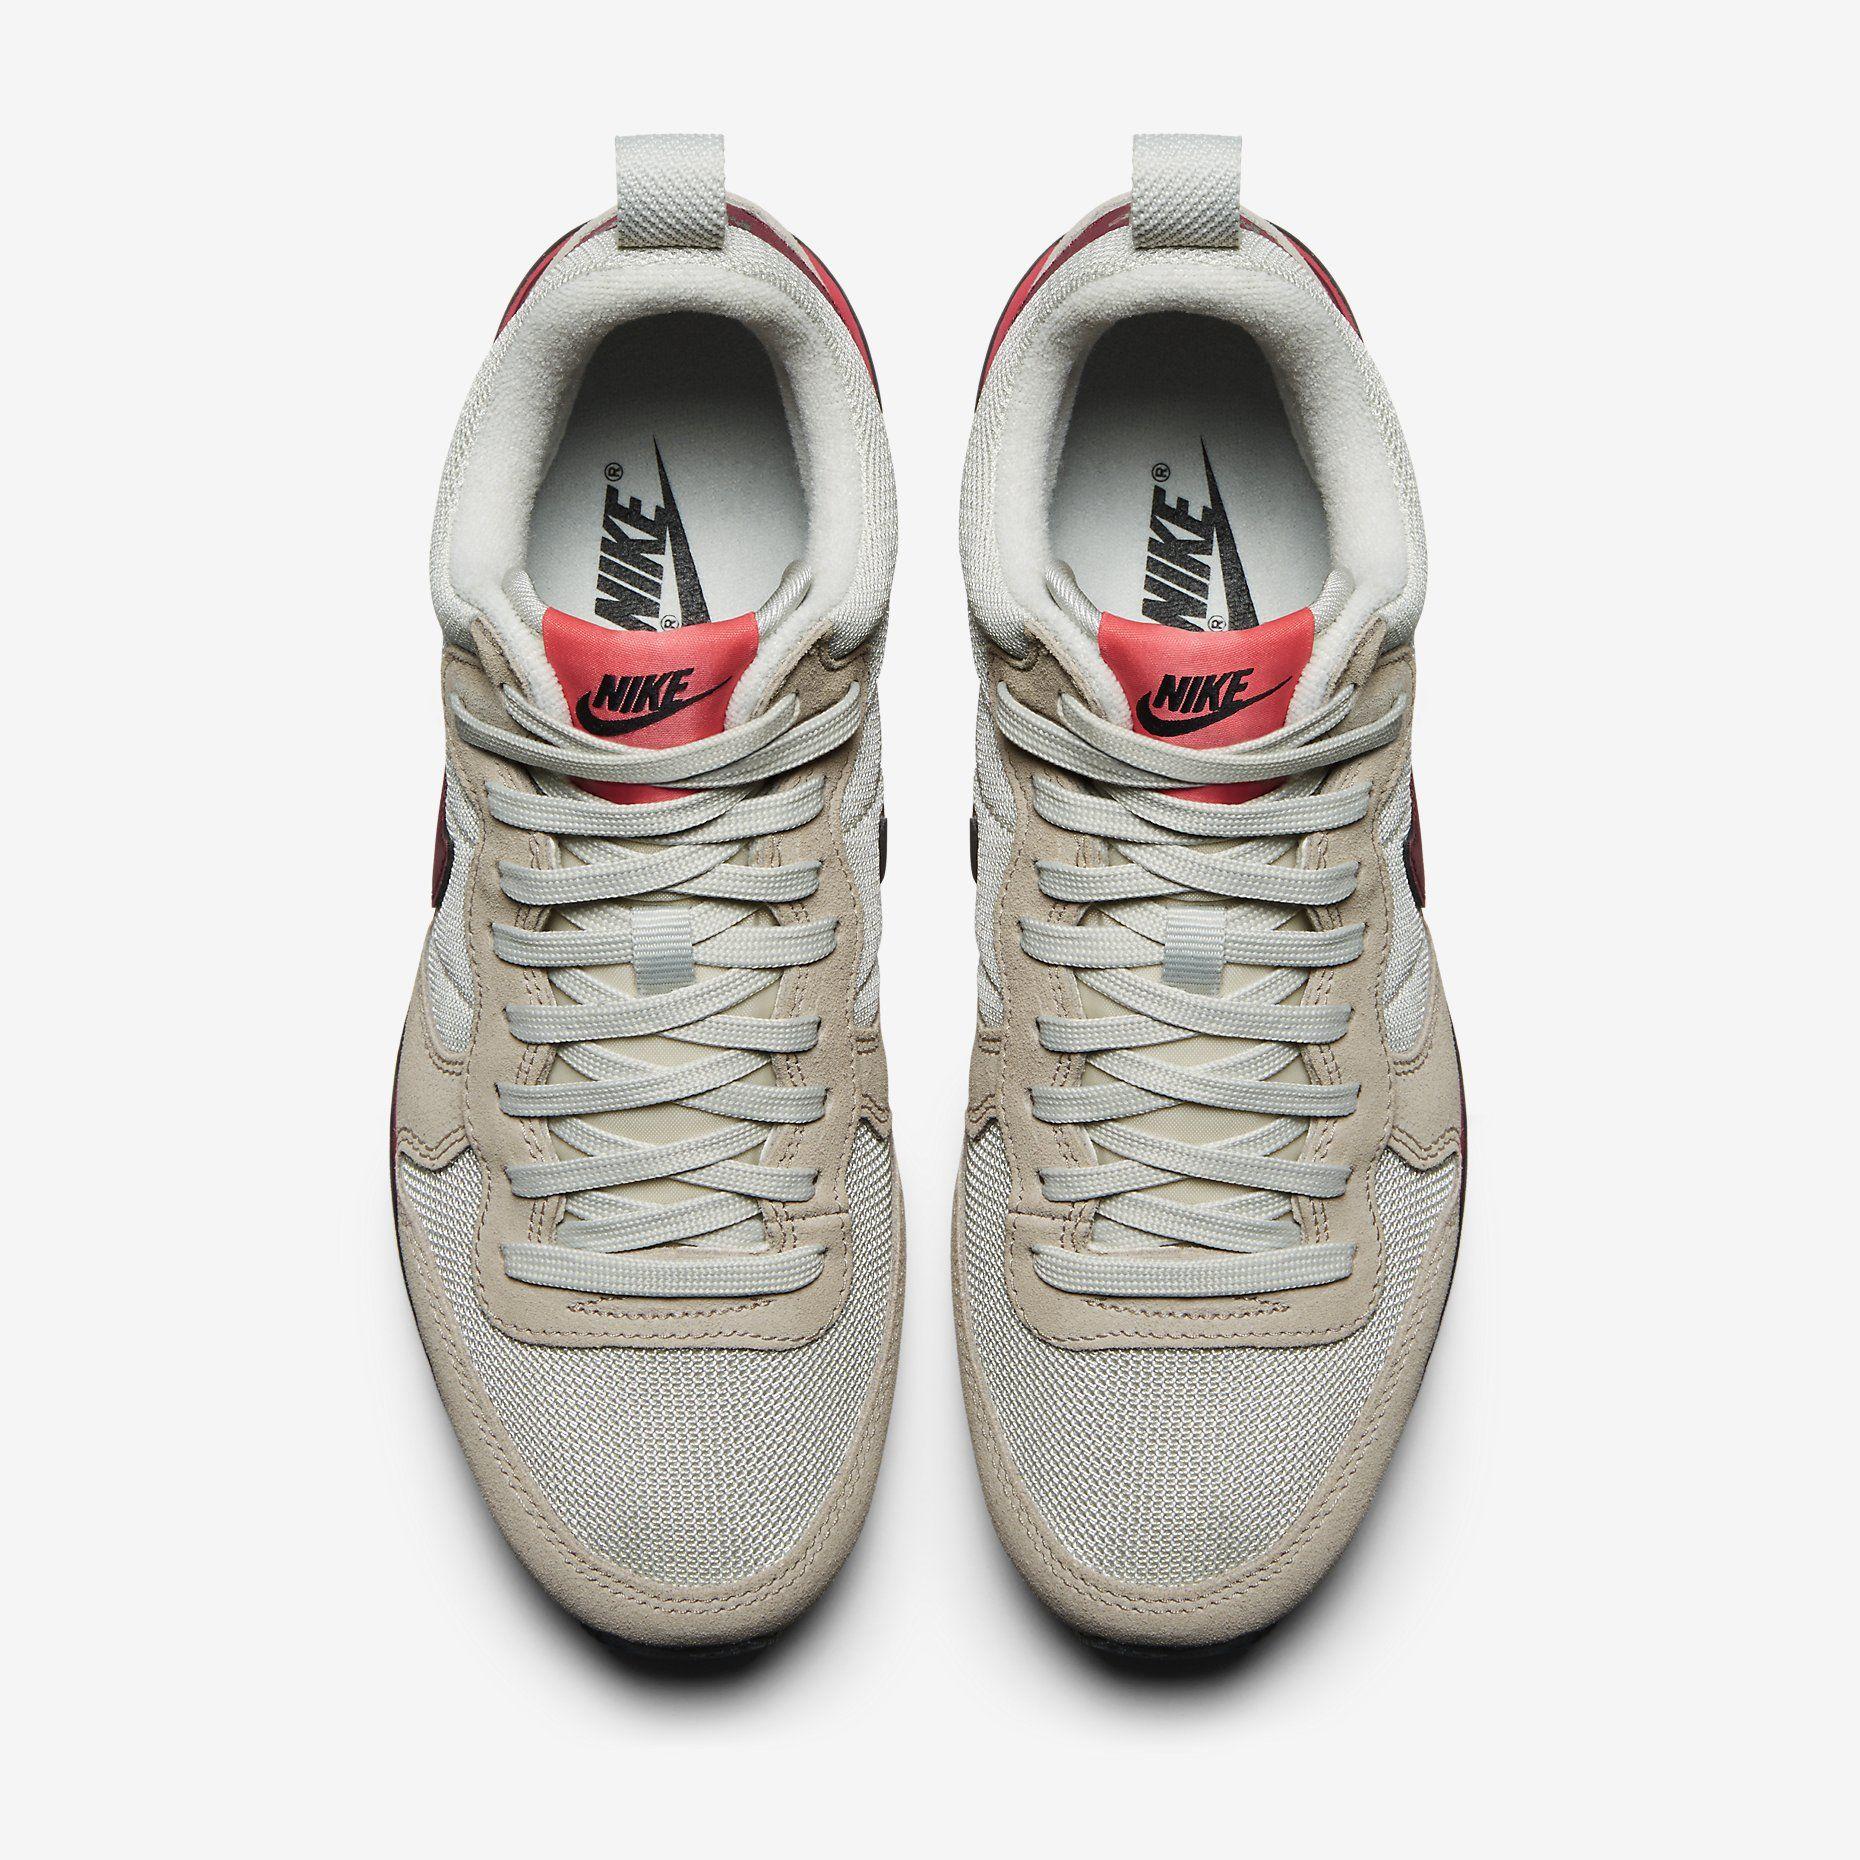 the latest 46c98 73ec2 ... Nike Internationalist Mid – Chaussure pour Femme. Nike Store FR  Nike  Internationalist Mid shoes ...